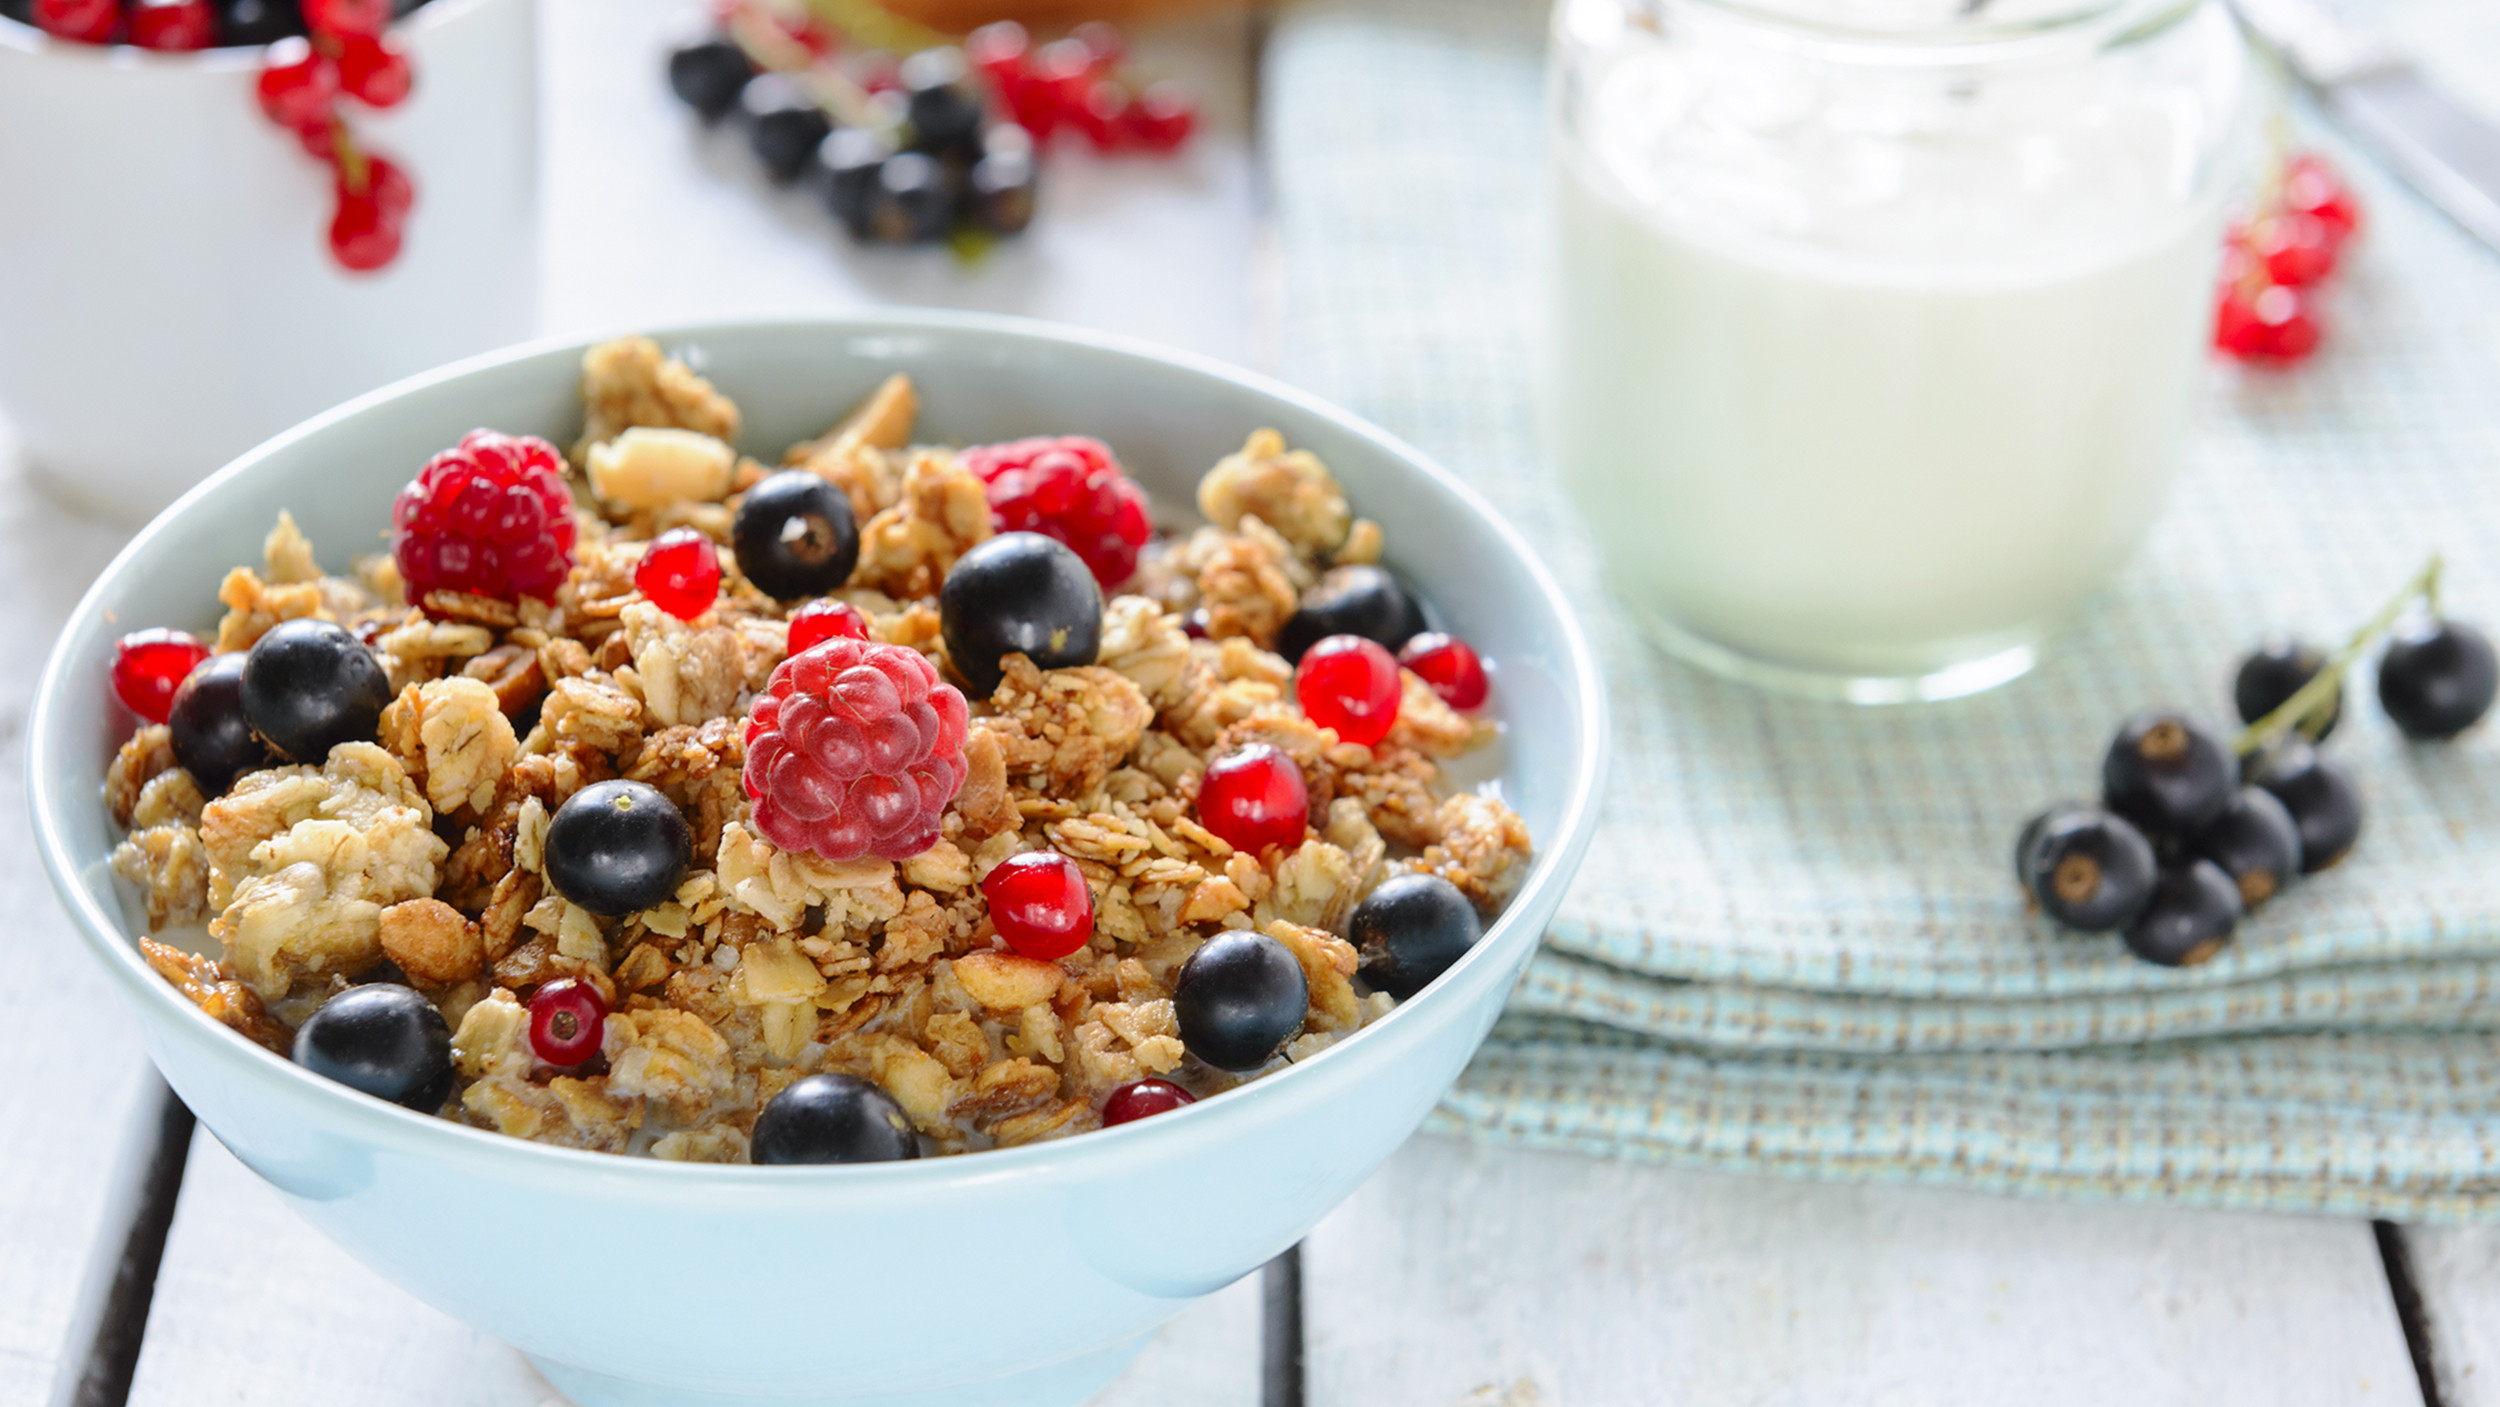 Healthy Breakfast Cereals  The healthiest breakfast cereals what to look for